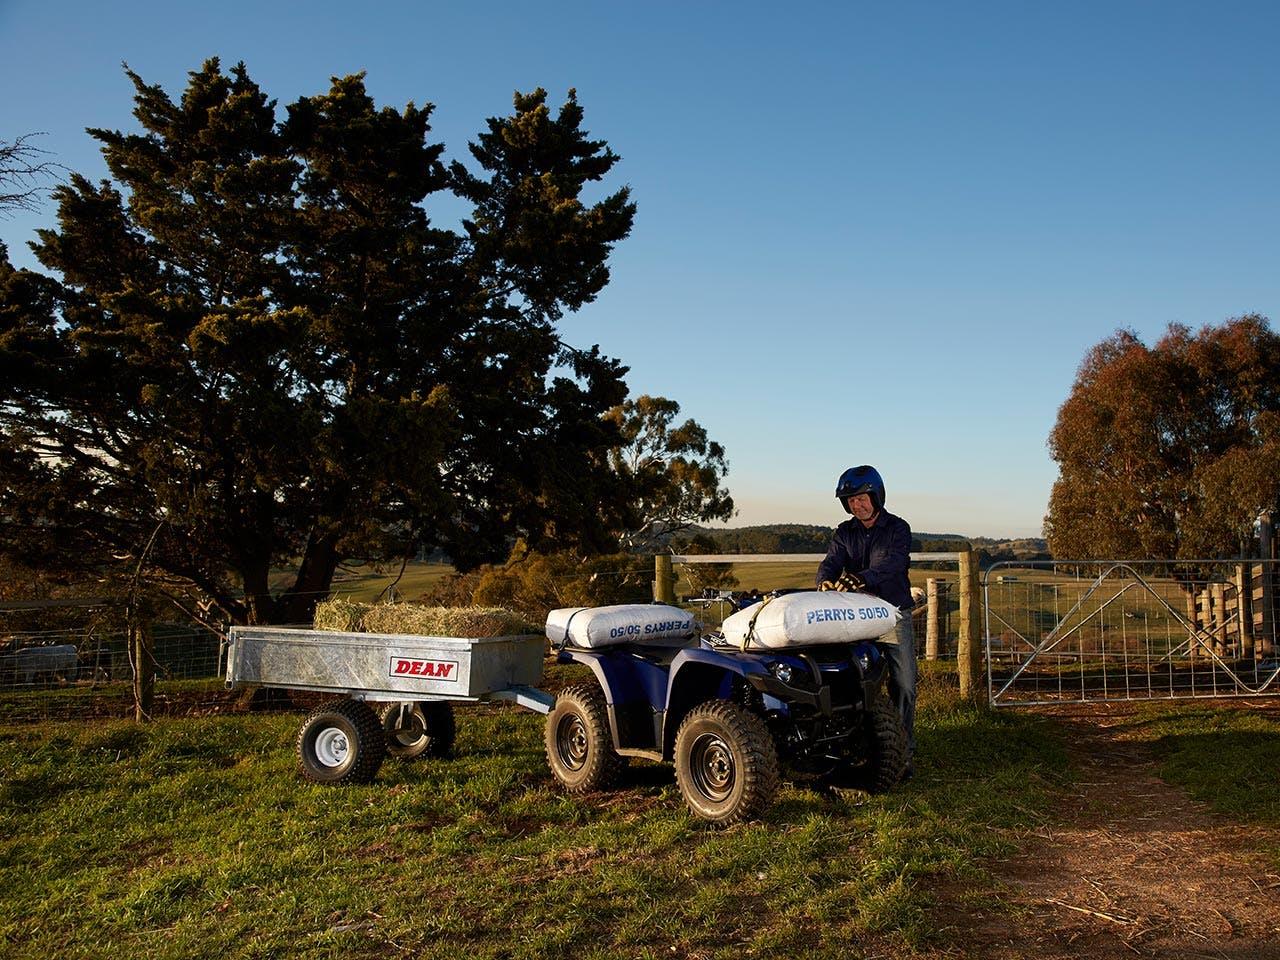 Yamaha Kodiak 450 in steel blue towing hay bales